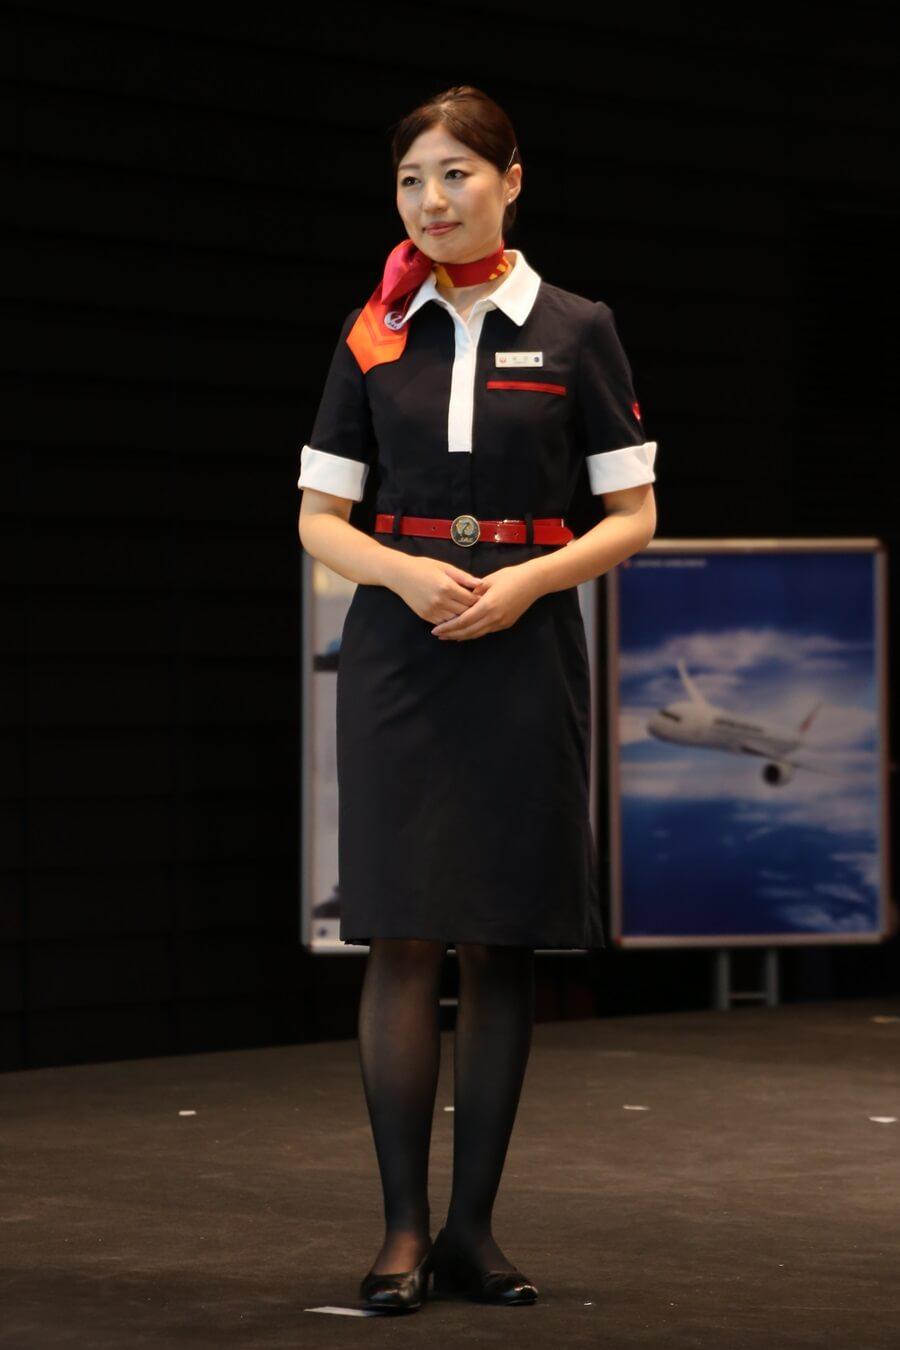 JEX3代目制服 JALとJEX客室乗務員歴代制服ファッションショー 客室乗務員 スチワーデス 歴代ユニフォーム 制服 空の日フェスティバル JAL fashion show JAL Express JEX (3)